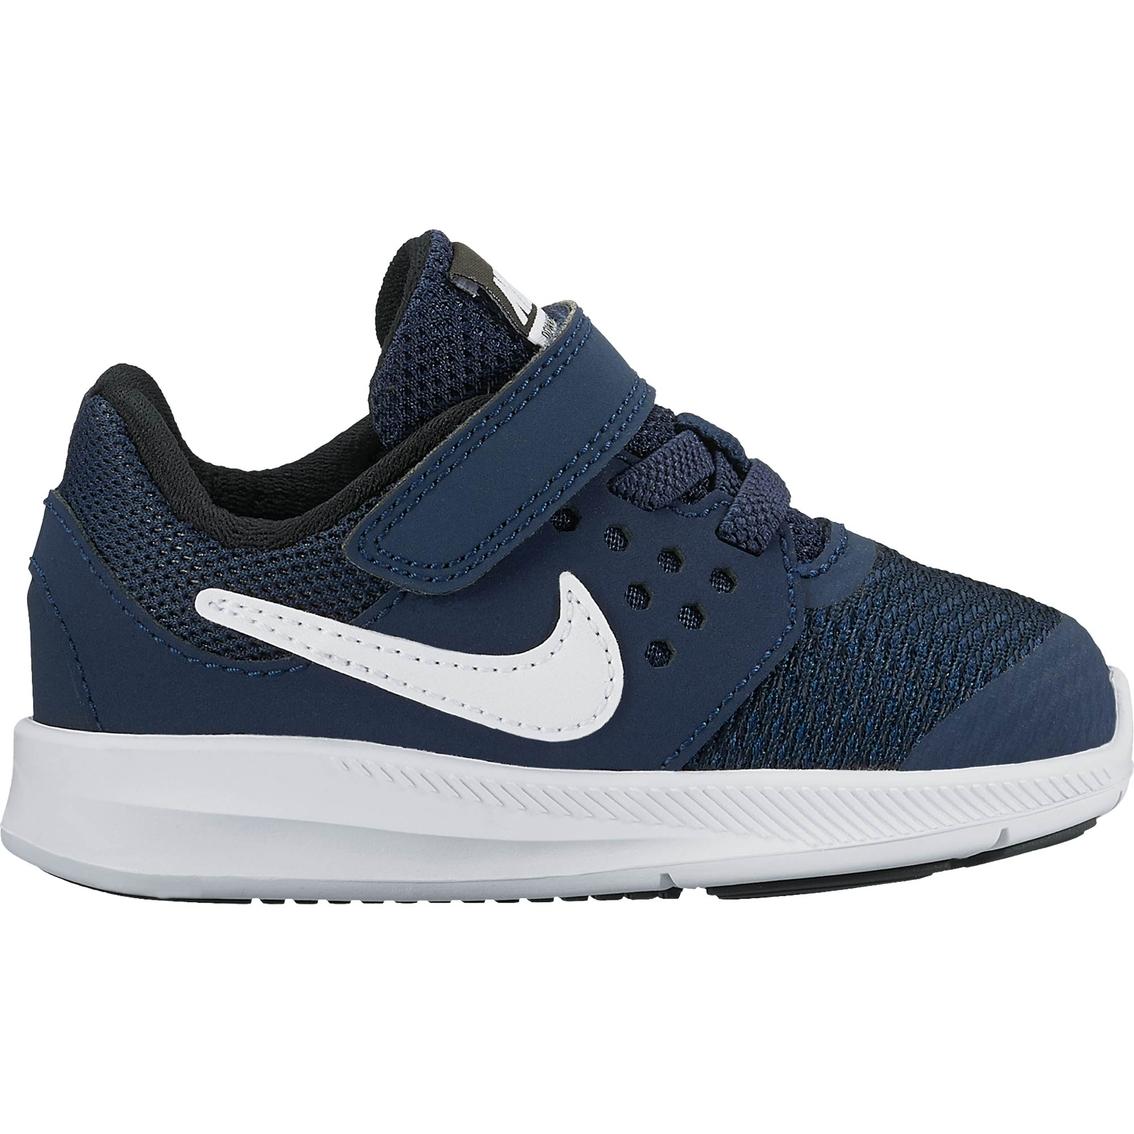 b42bc002e6c4 Nike Toddler Boys Downshifter 7 Shoes